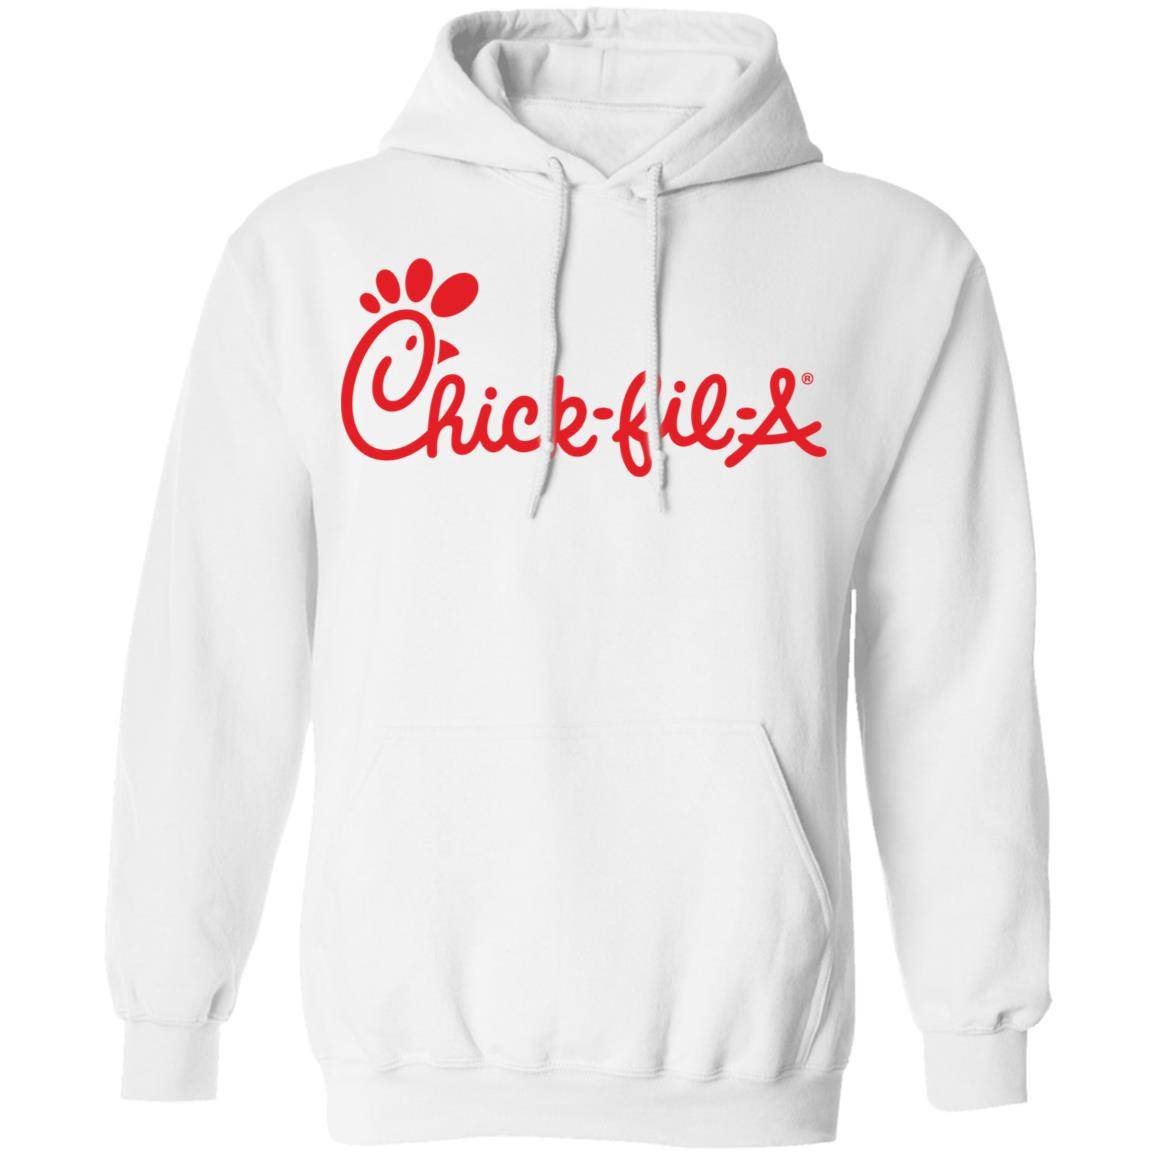 Chick Fil A – Hoodie for Men, Women